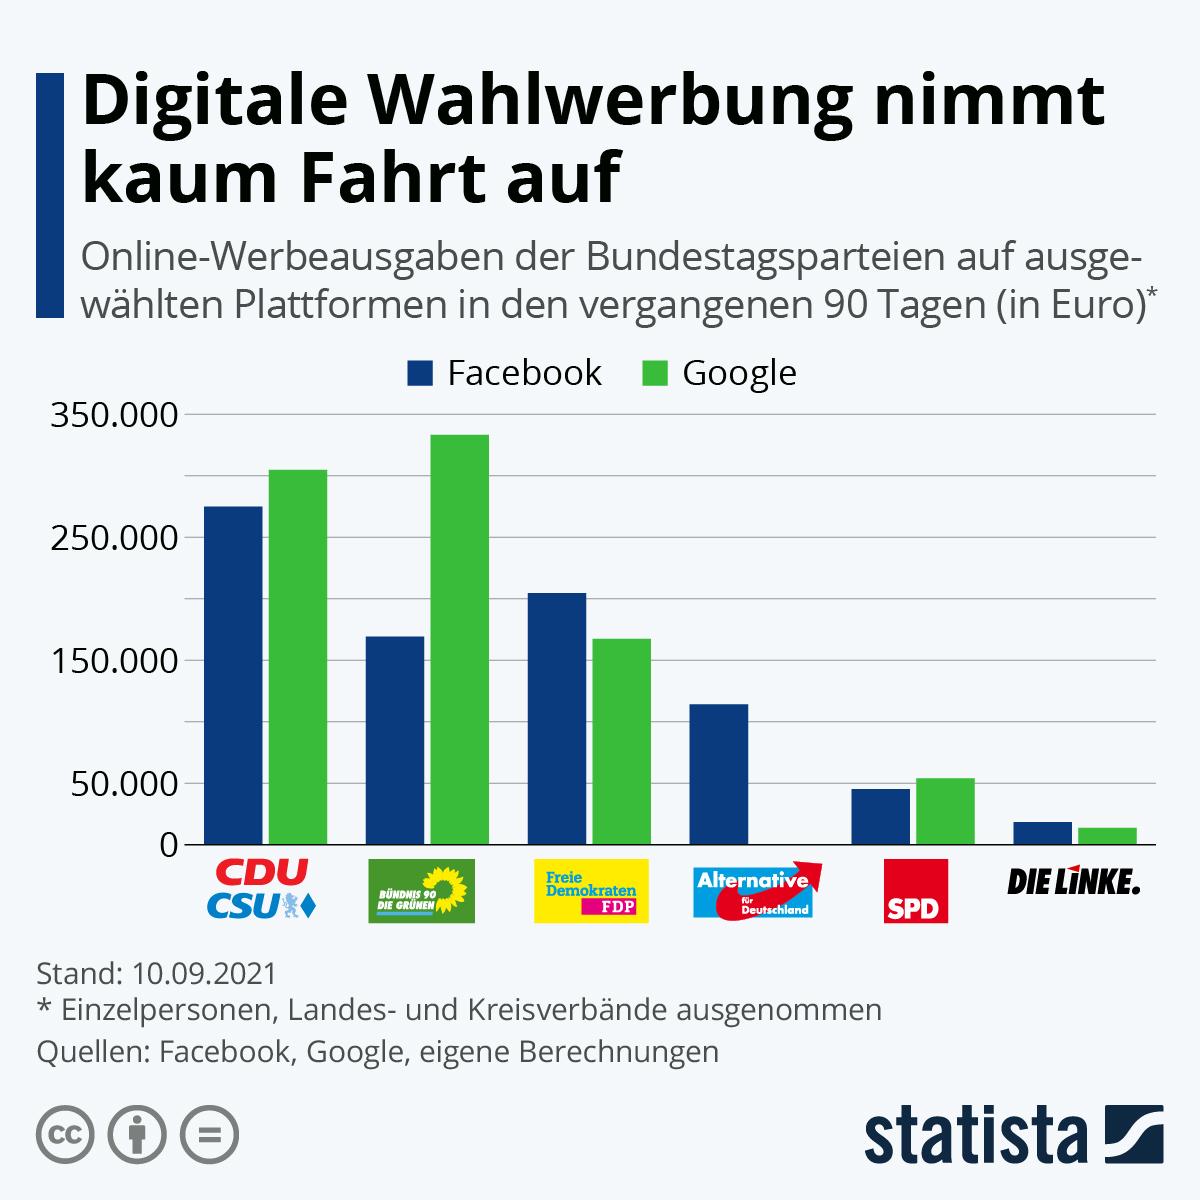 Infografik: Digitale Wahlwerbung nimmt kaum Fahrt auf   Statista